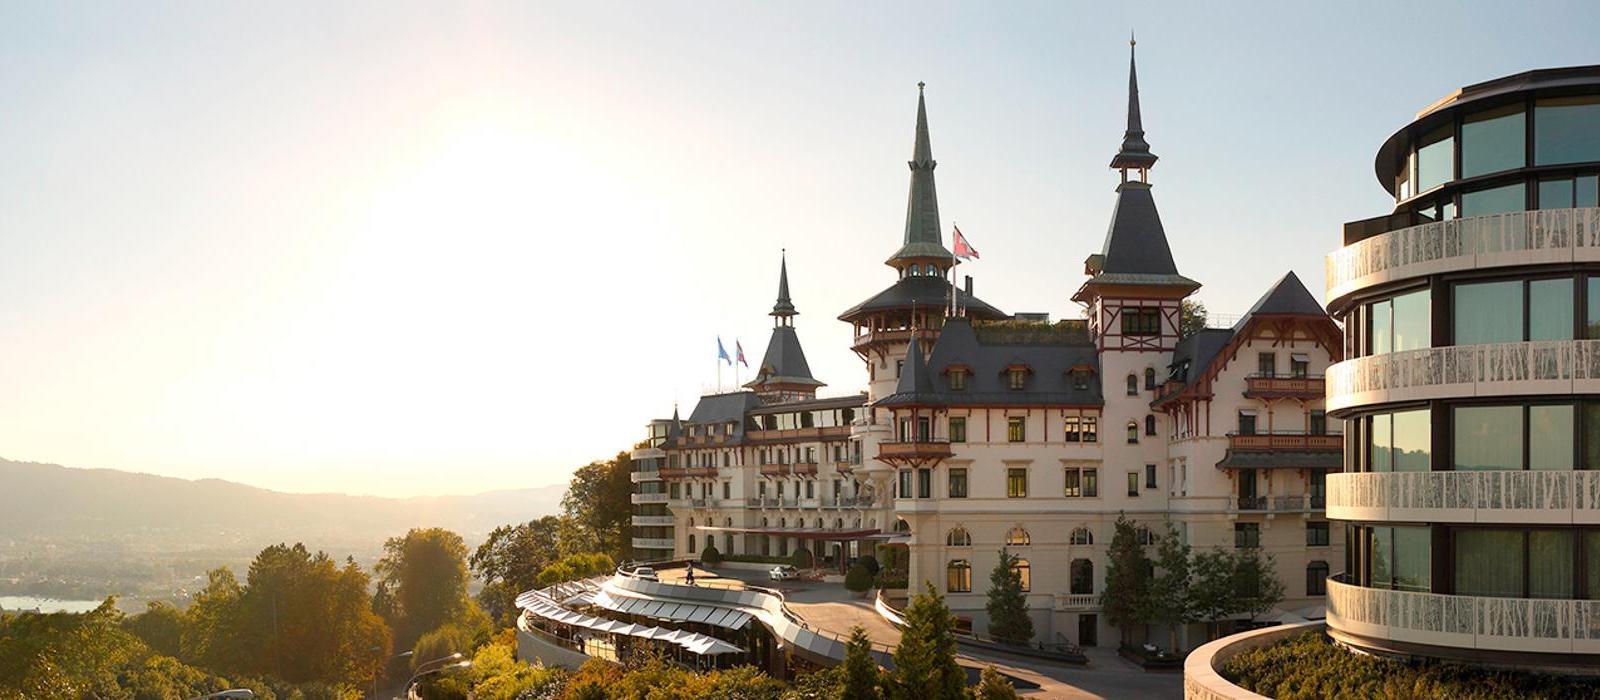 多尔德大酒店(The Dolder Grand) 图片  www.lhw.cn